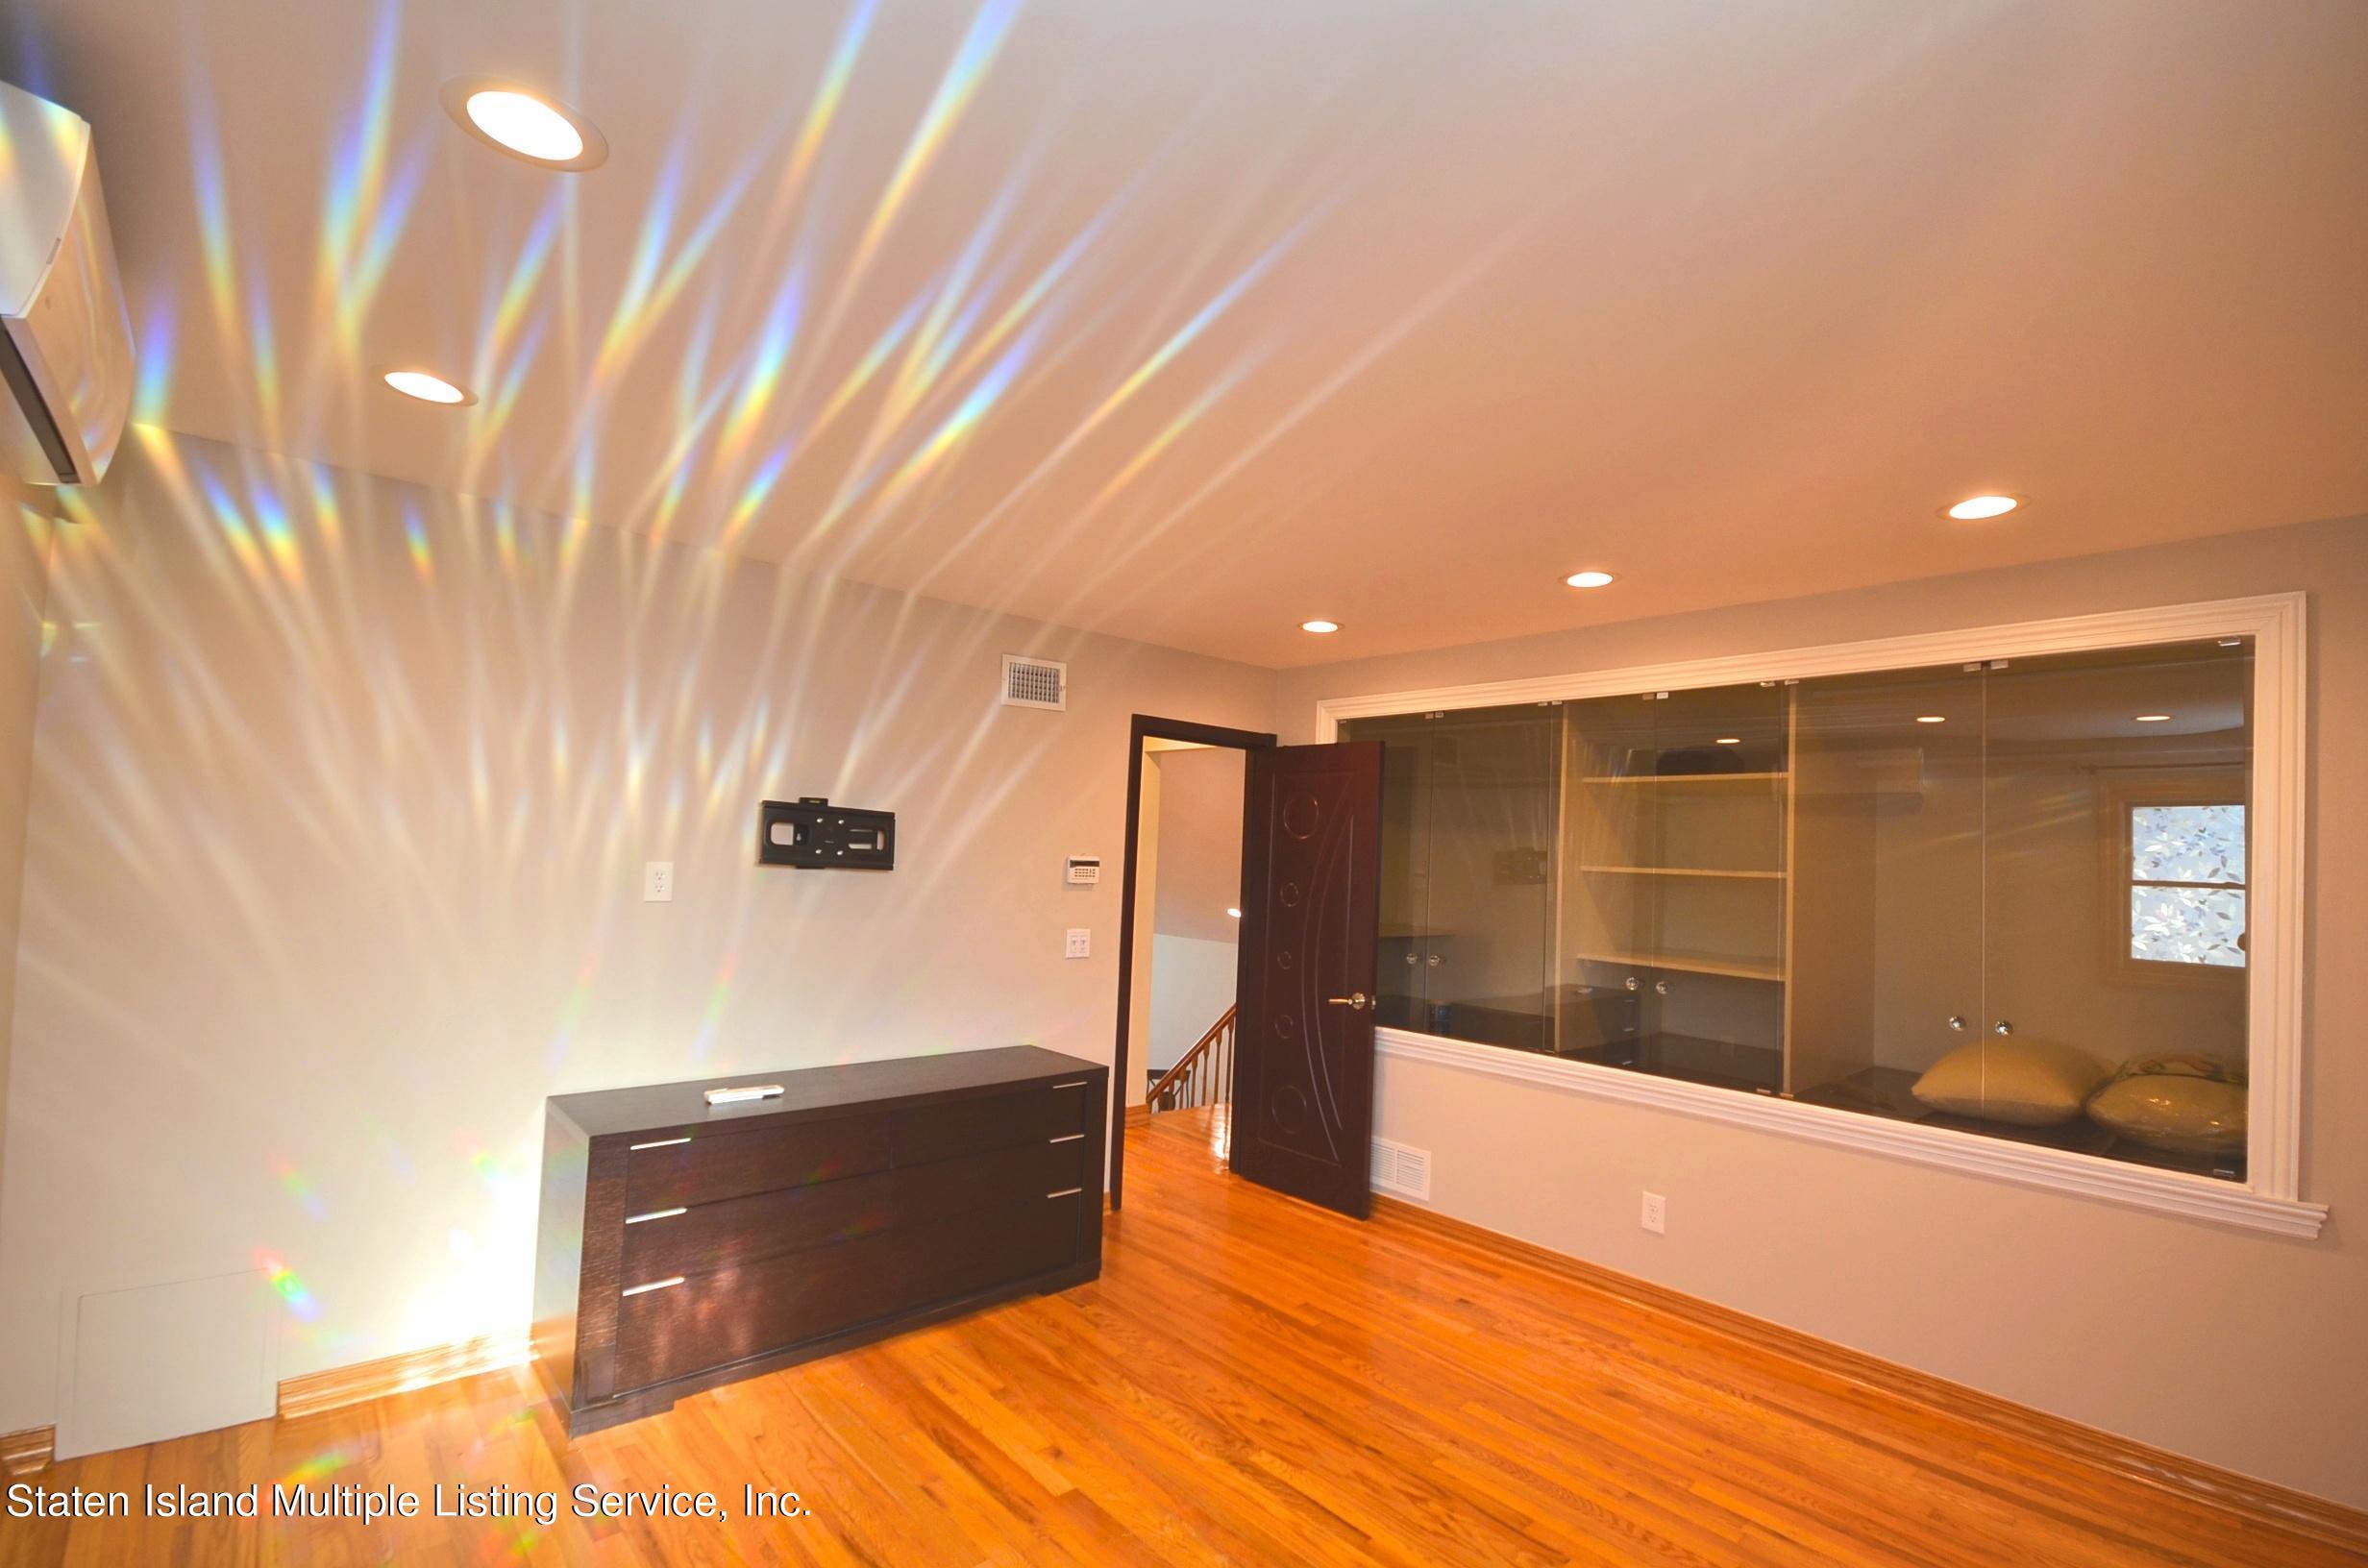 Single Family - Detached 48 Ocean Terrace  Staten Island, NY 10314, MLS-1142240-17